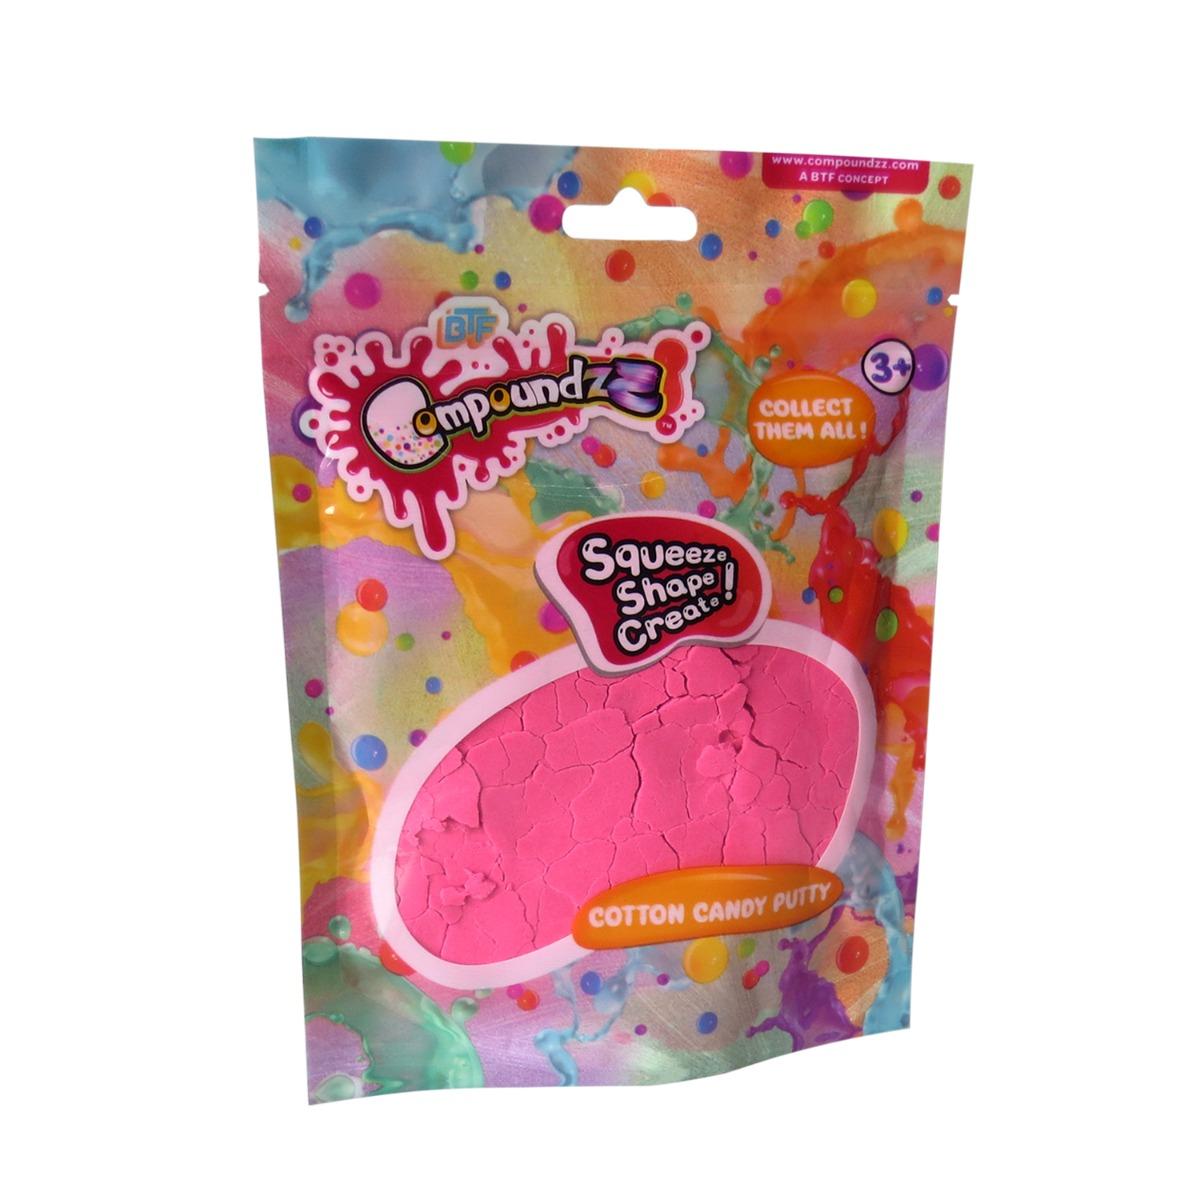 Punguta cu pasta modelatoare Compoundzz, Cotton Candy Putty